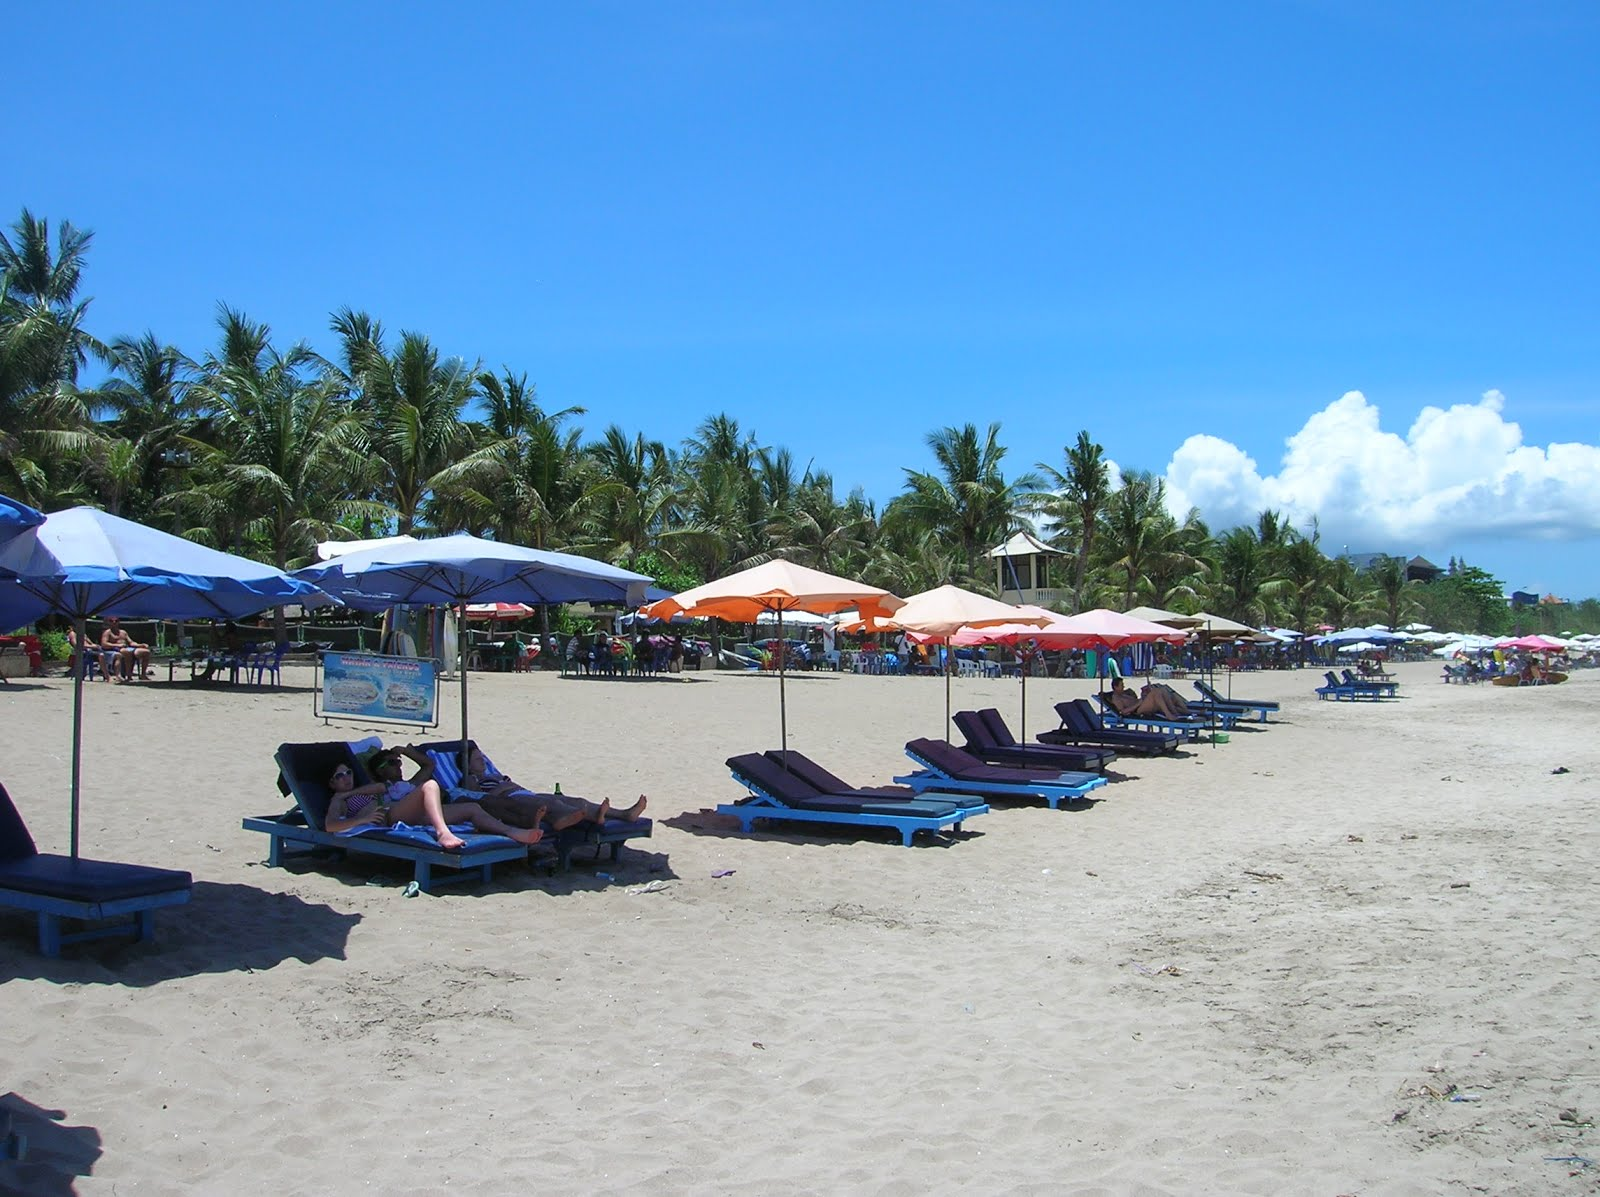 Playa Legian, Legian, Bali, vuelta al mundo, round the world, La vuelta al mundo de Asun y Ricardo